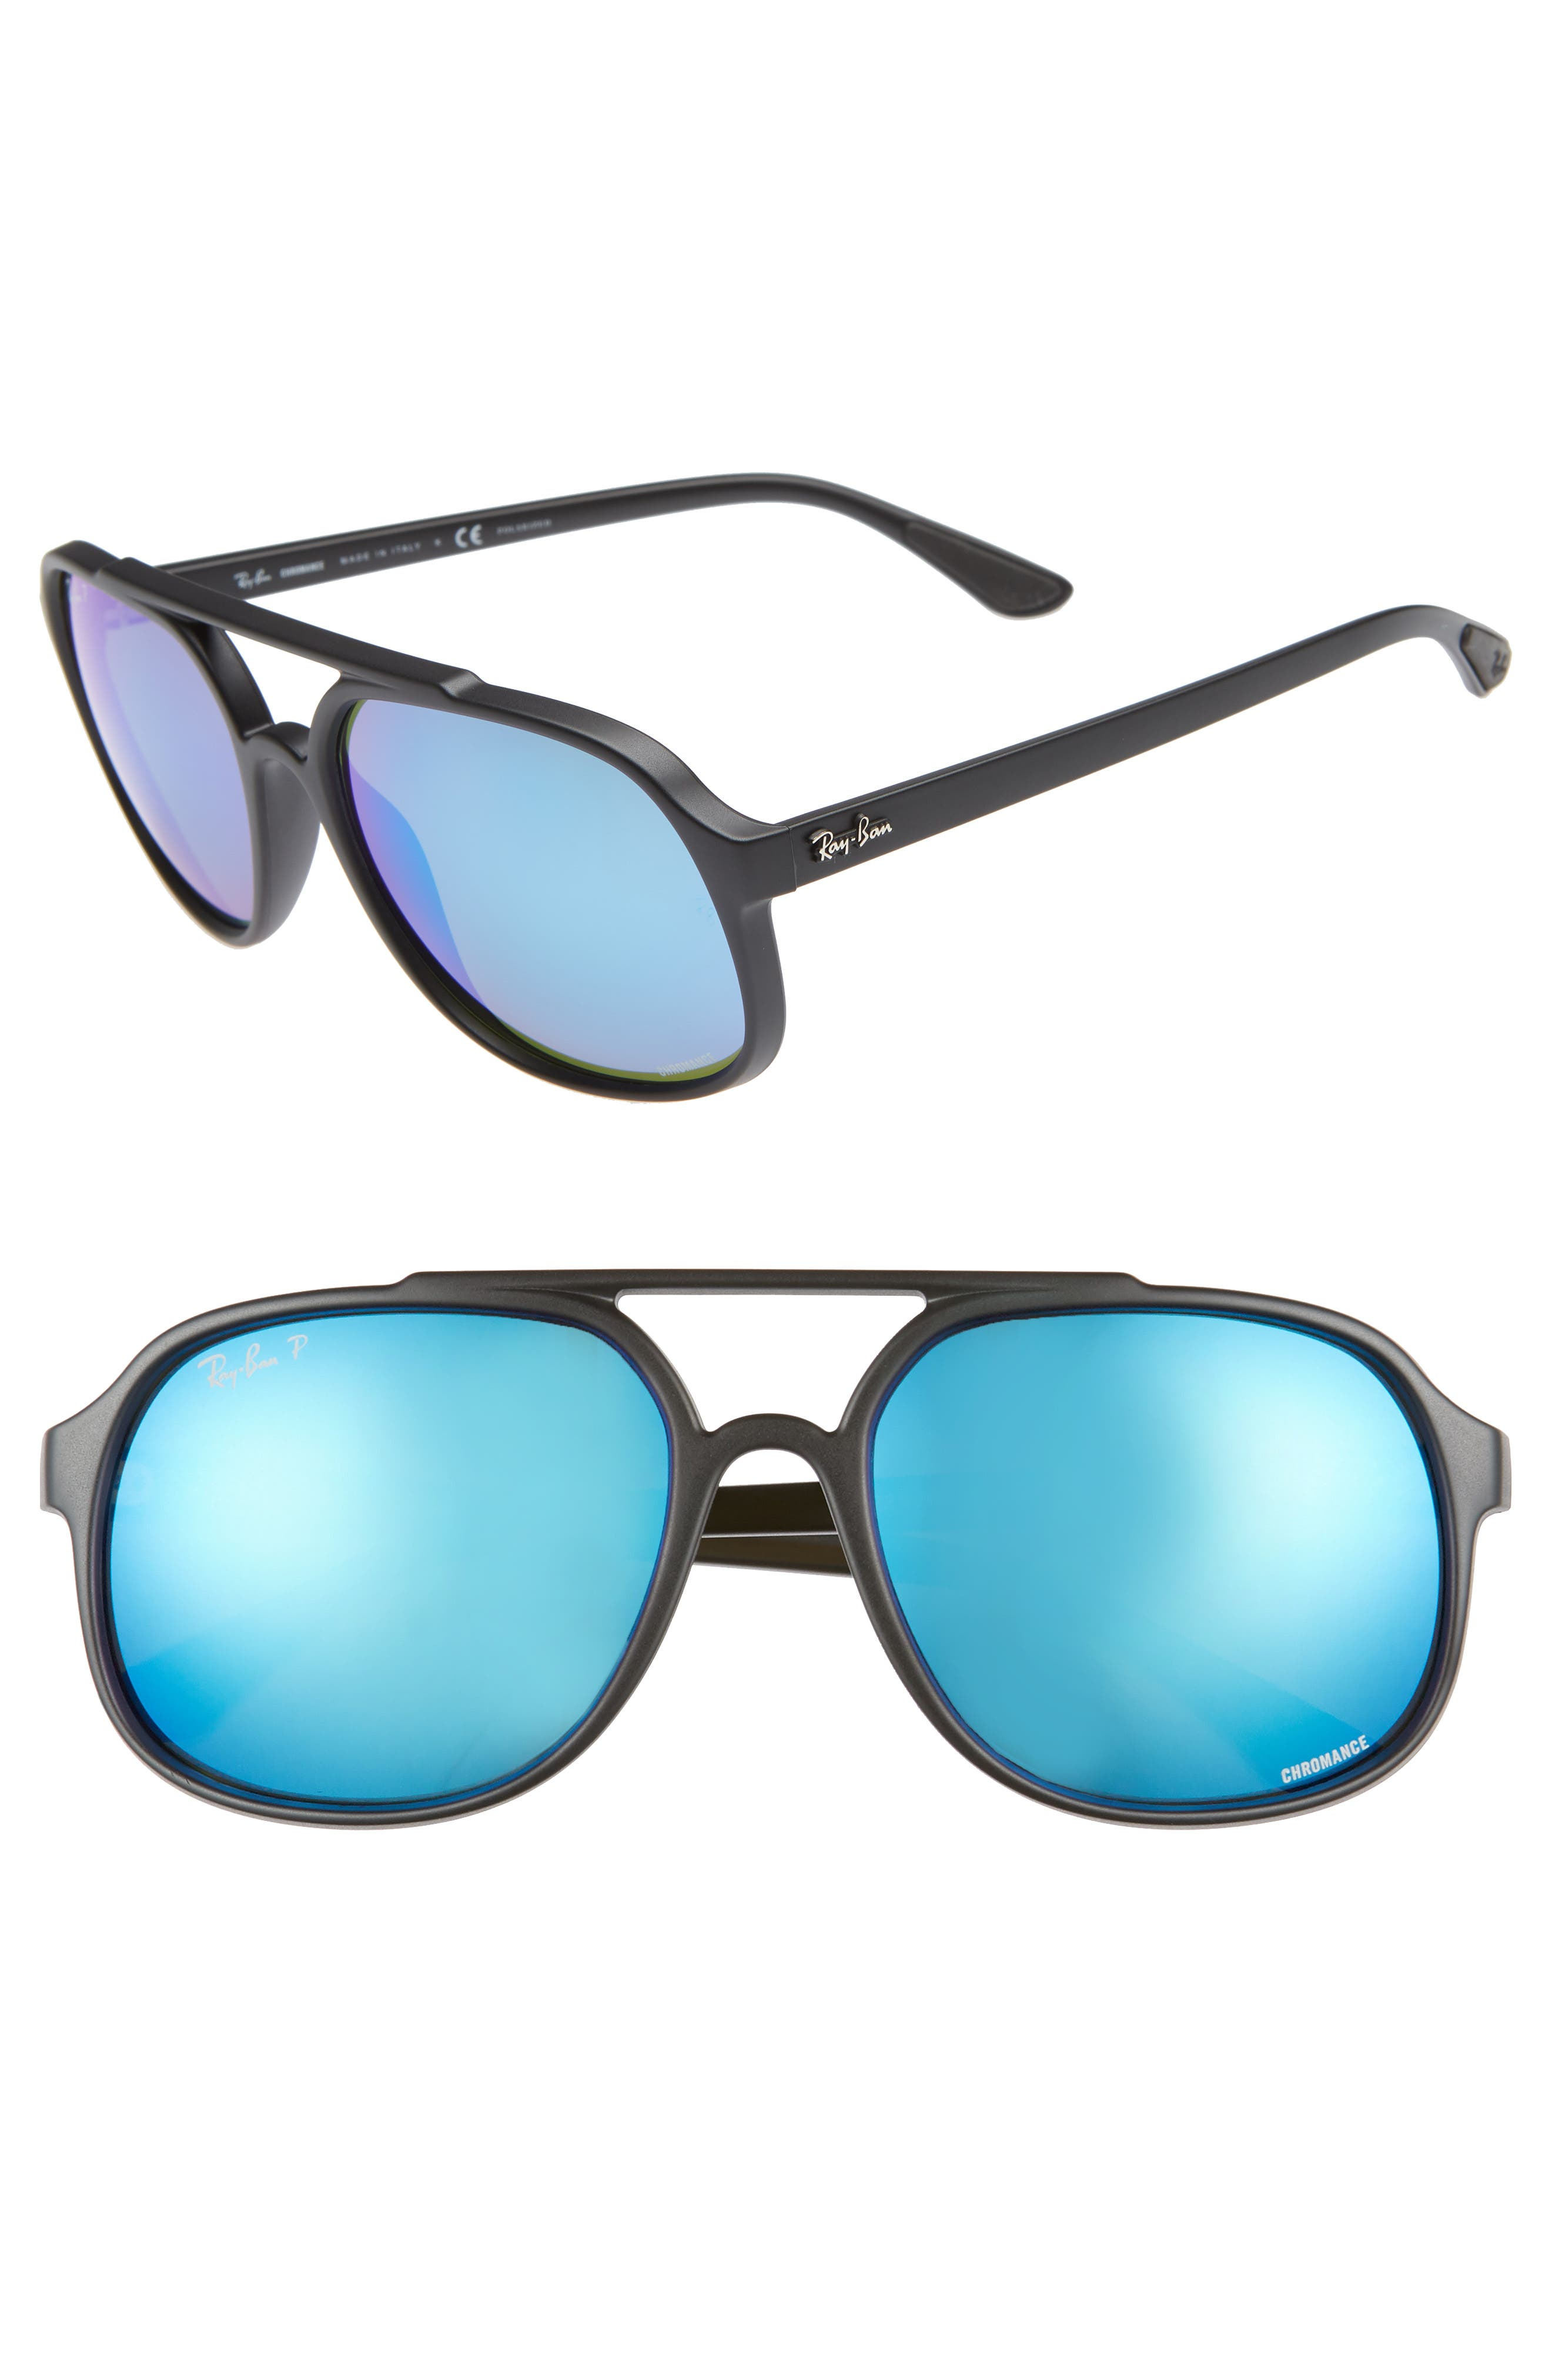 Ray-Ban 57Mm Polarized Navigator Sunglasses - Matte Black